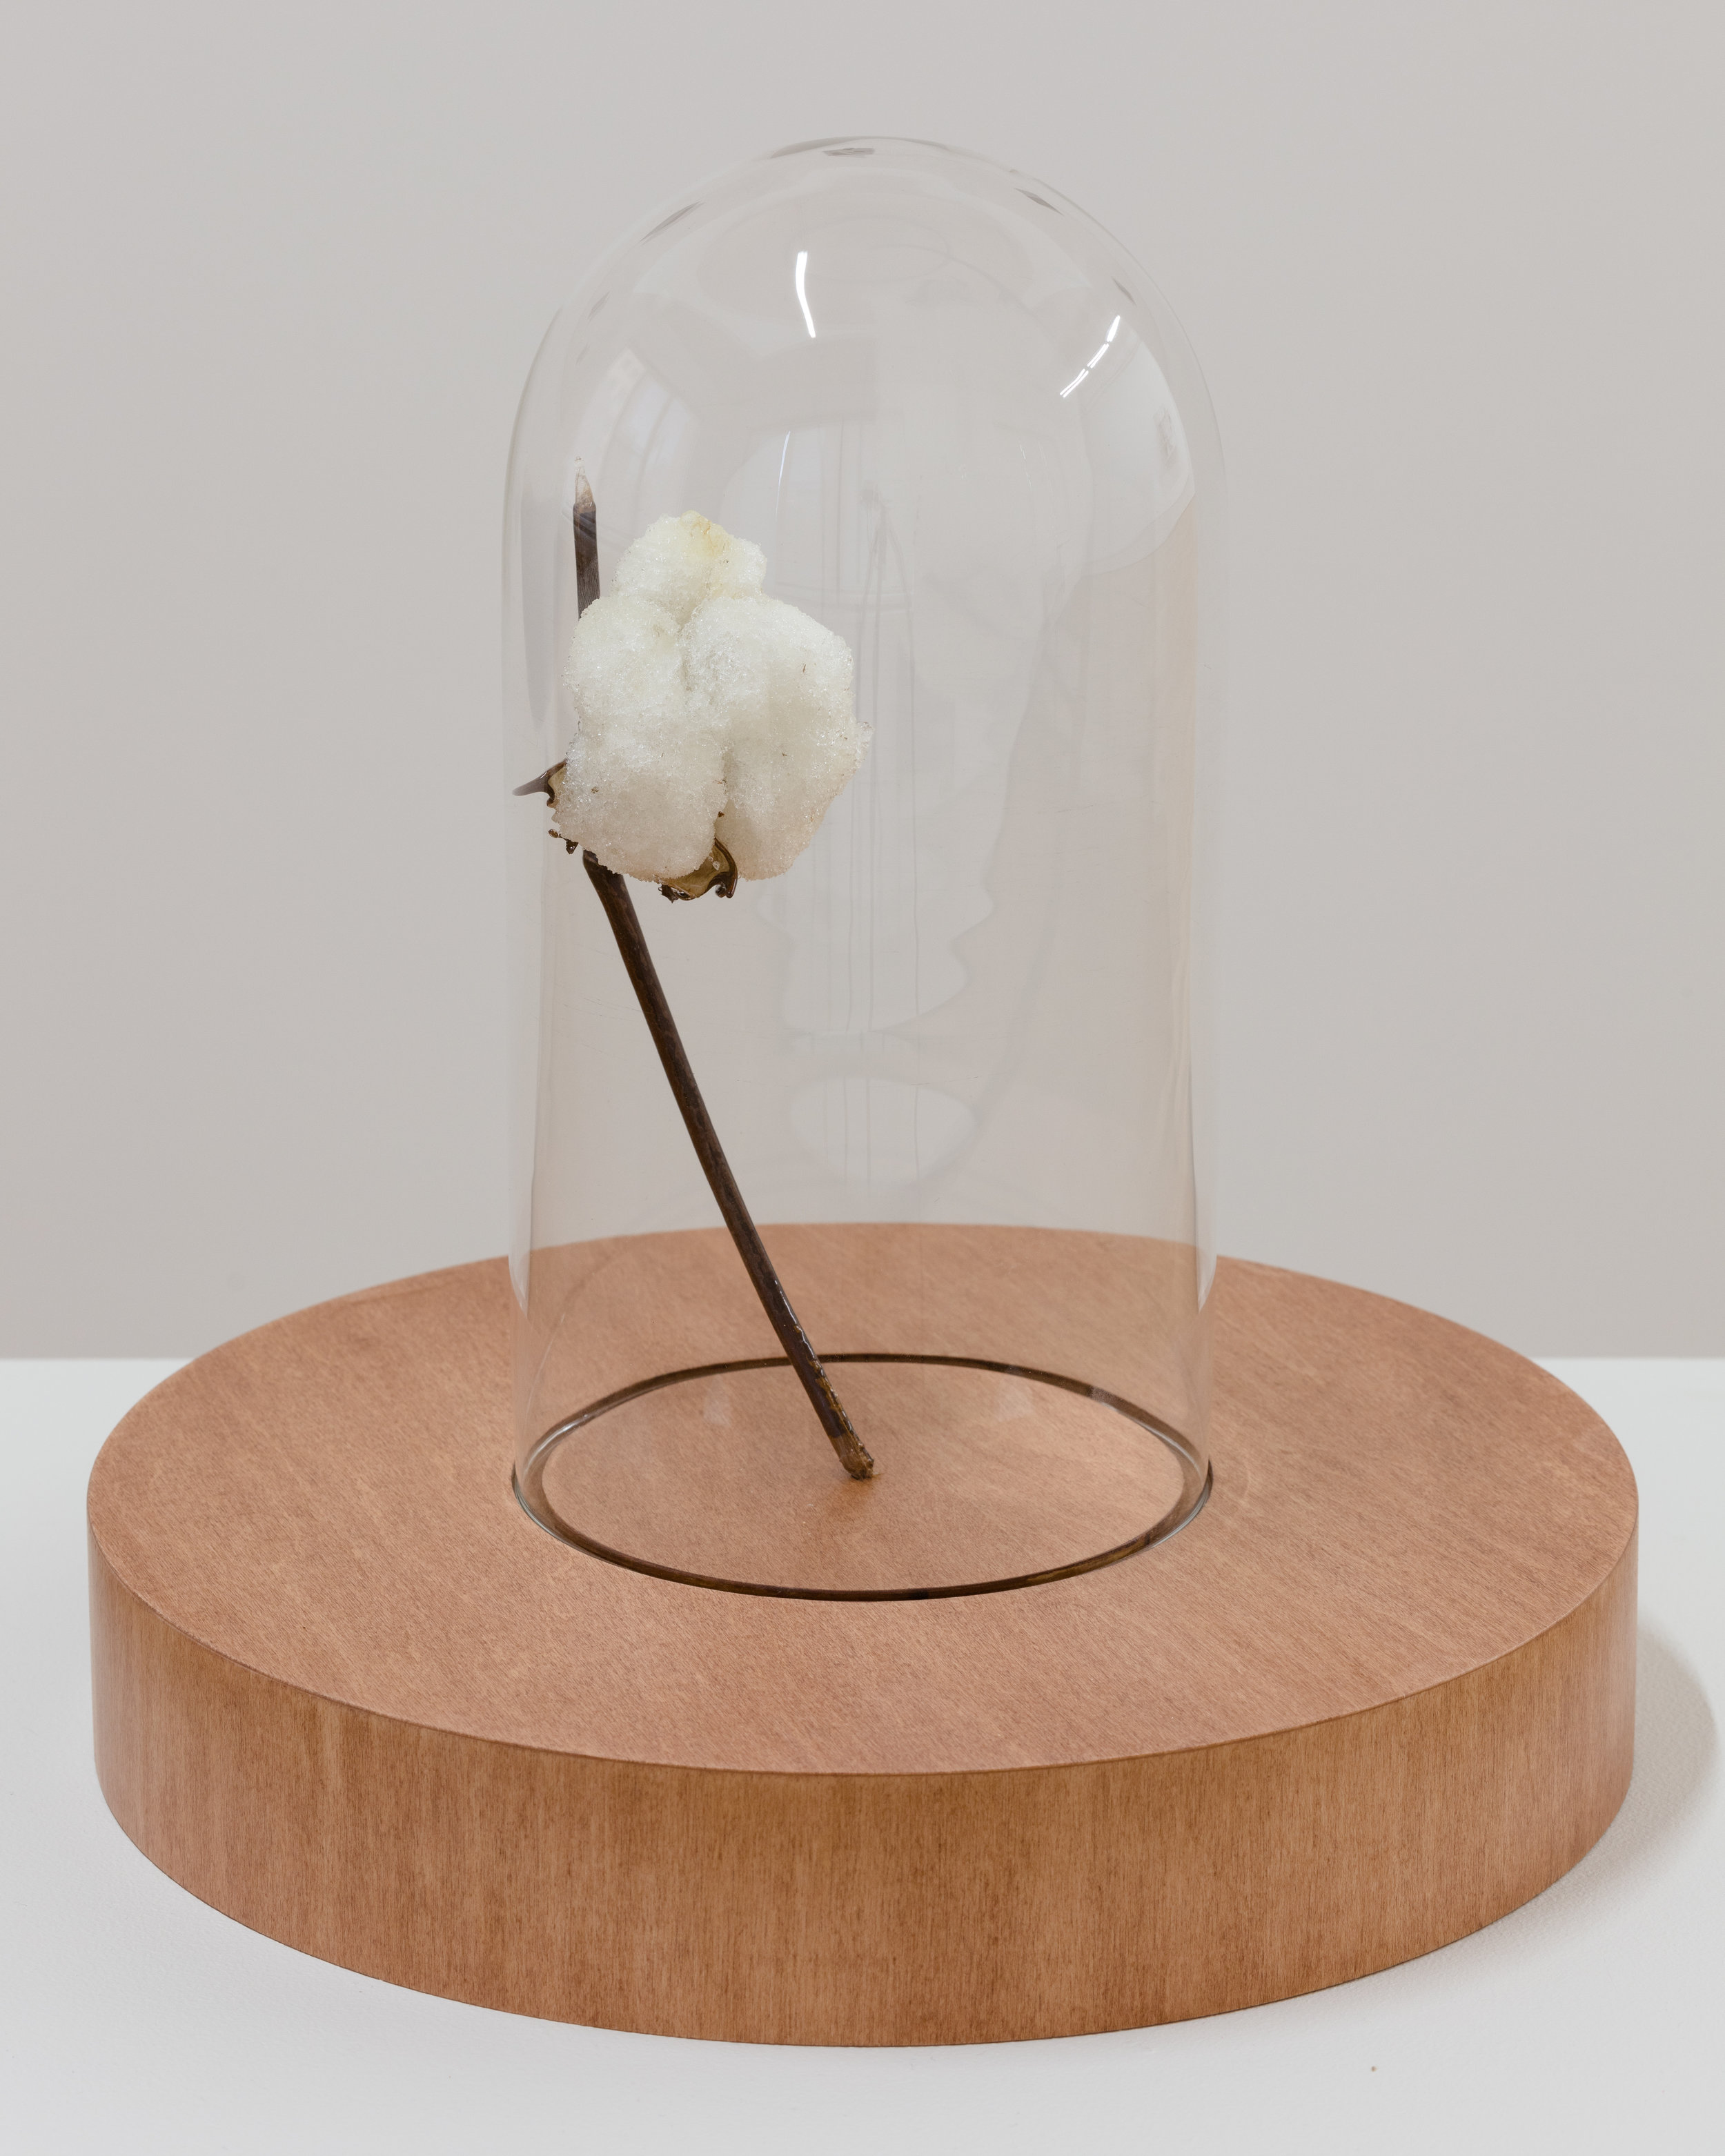 Aria Dean, Dead Zone (2), 2017, Cotton branch, polyurethane, bell jar, wood, signal jammer, 13 1/4 x 12 1/2 in. (33 3/4 x 31 3/4 cm.), Château Shatto, Los Angeles